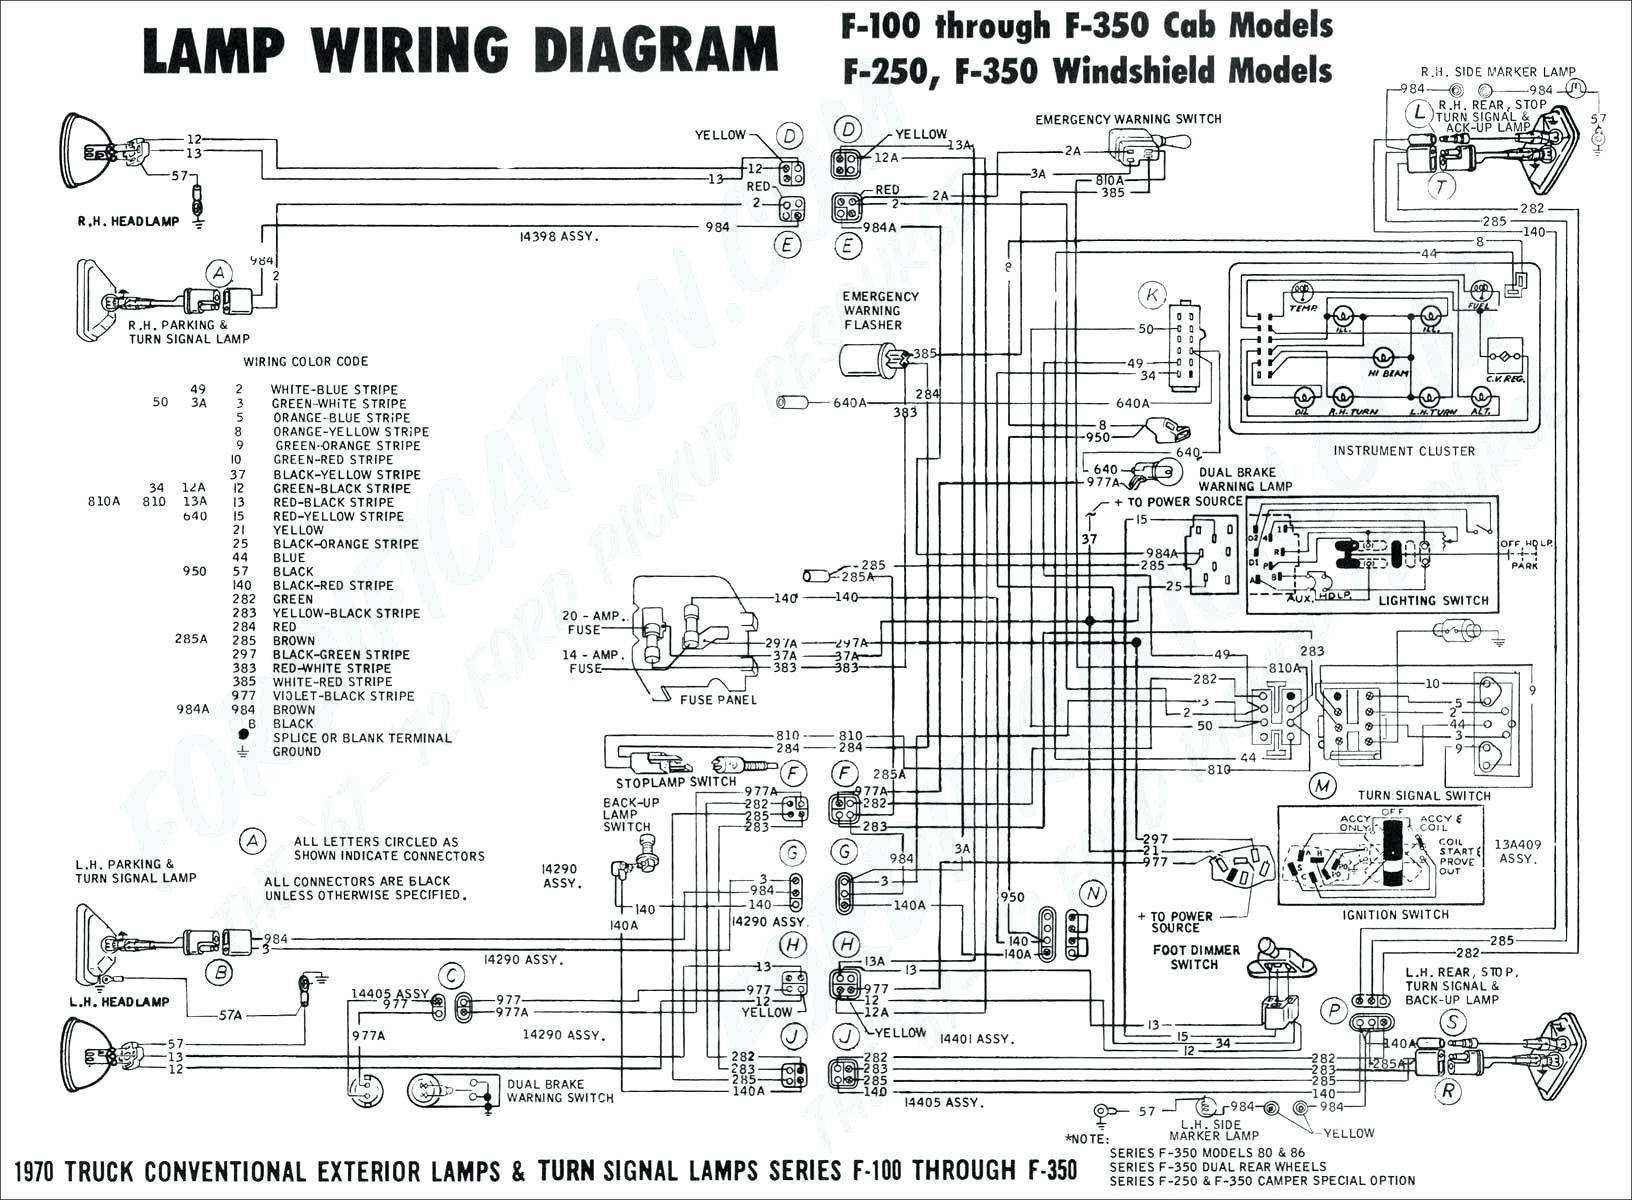 Unique Volkswagen Generator Wiring Diagram Diagram Diagramsample Diagramtemplate Wiring Trailer Wiring Diagram Electrical Diagram Electrical Wiring Diagram